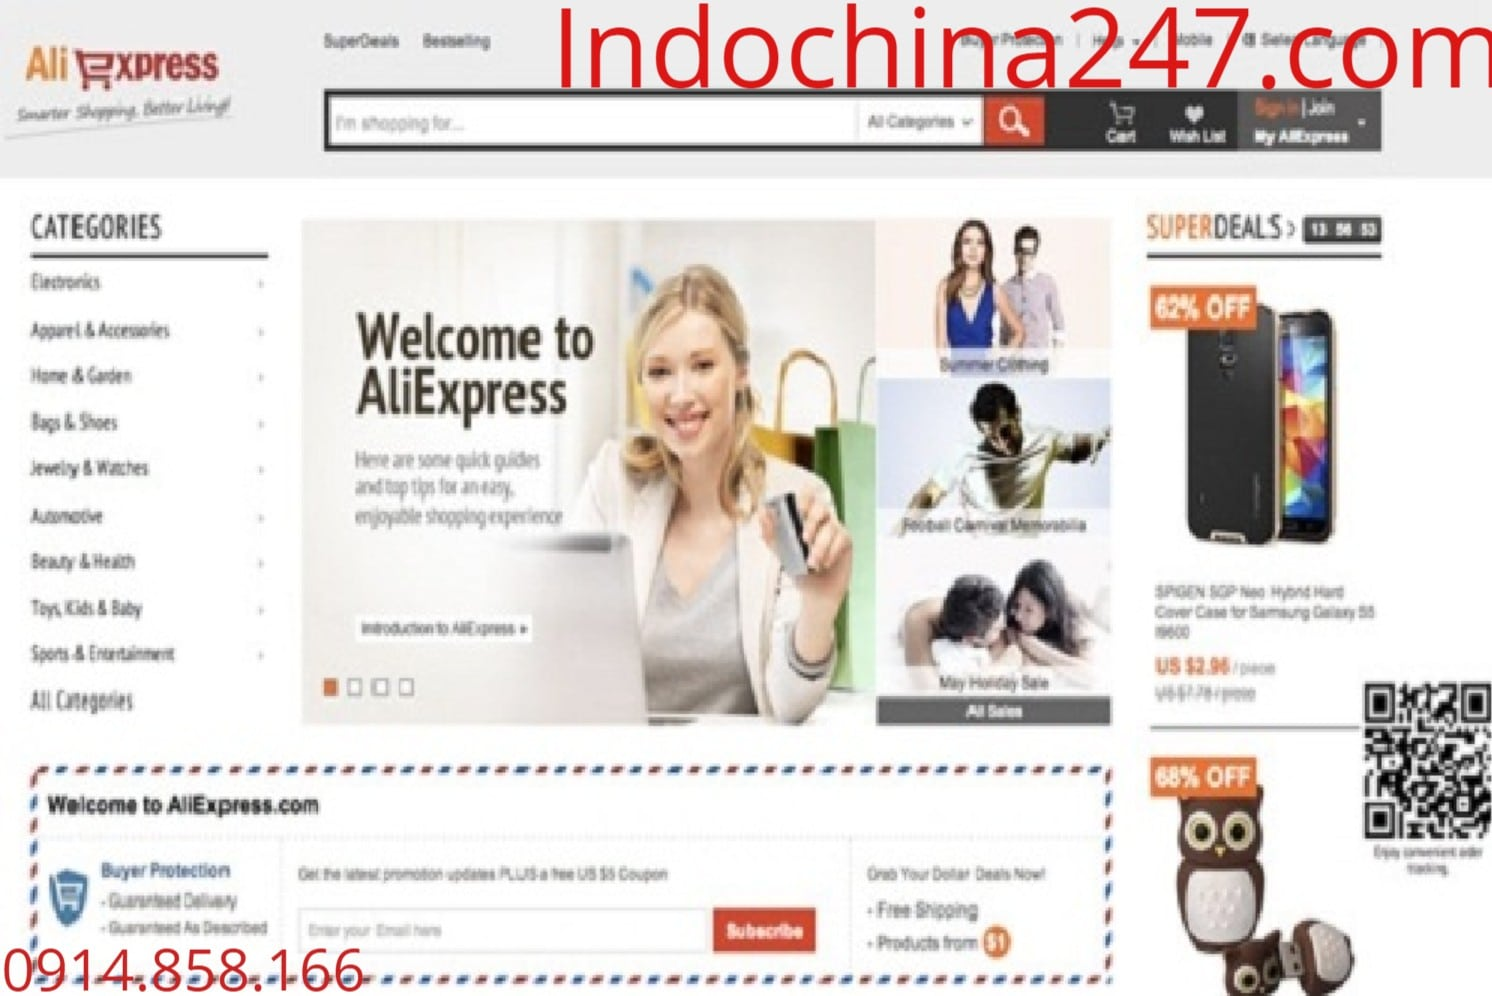 Indochina247.com/Tel: 0914.858.166